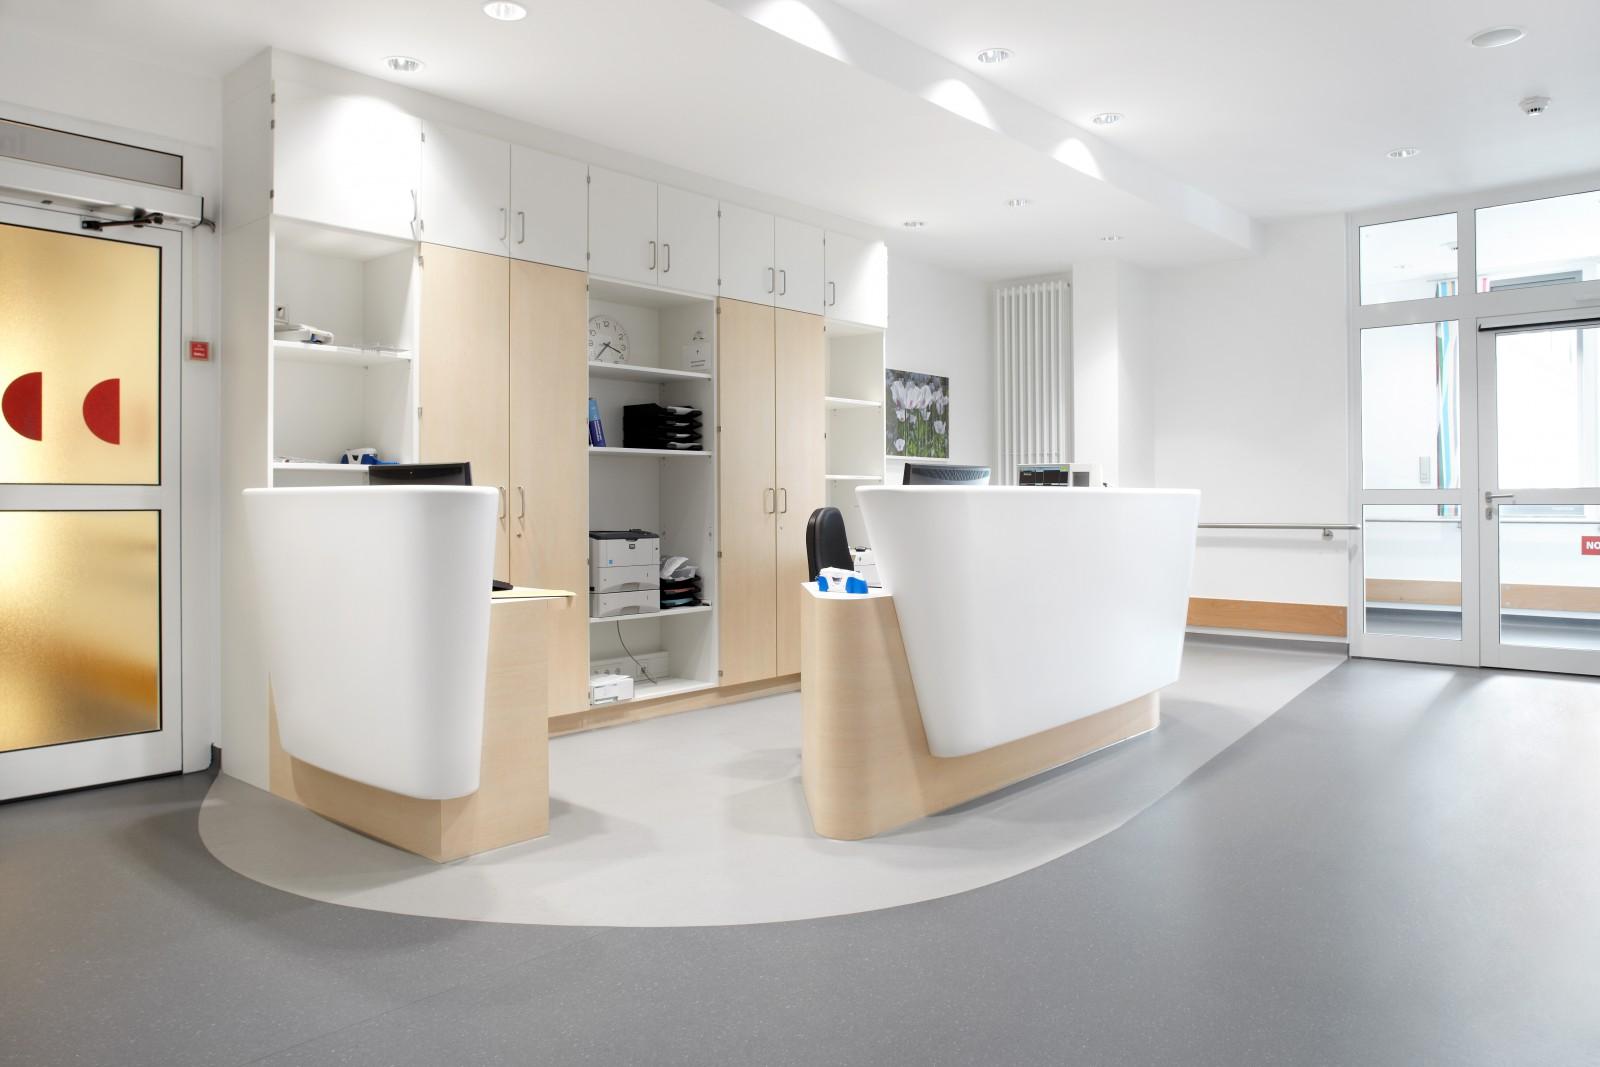 Theke ITS, Quelle: Forbo Flooring (www.forbo-flooring.de)